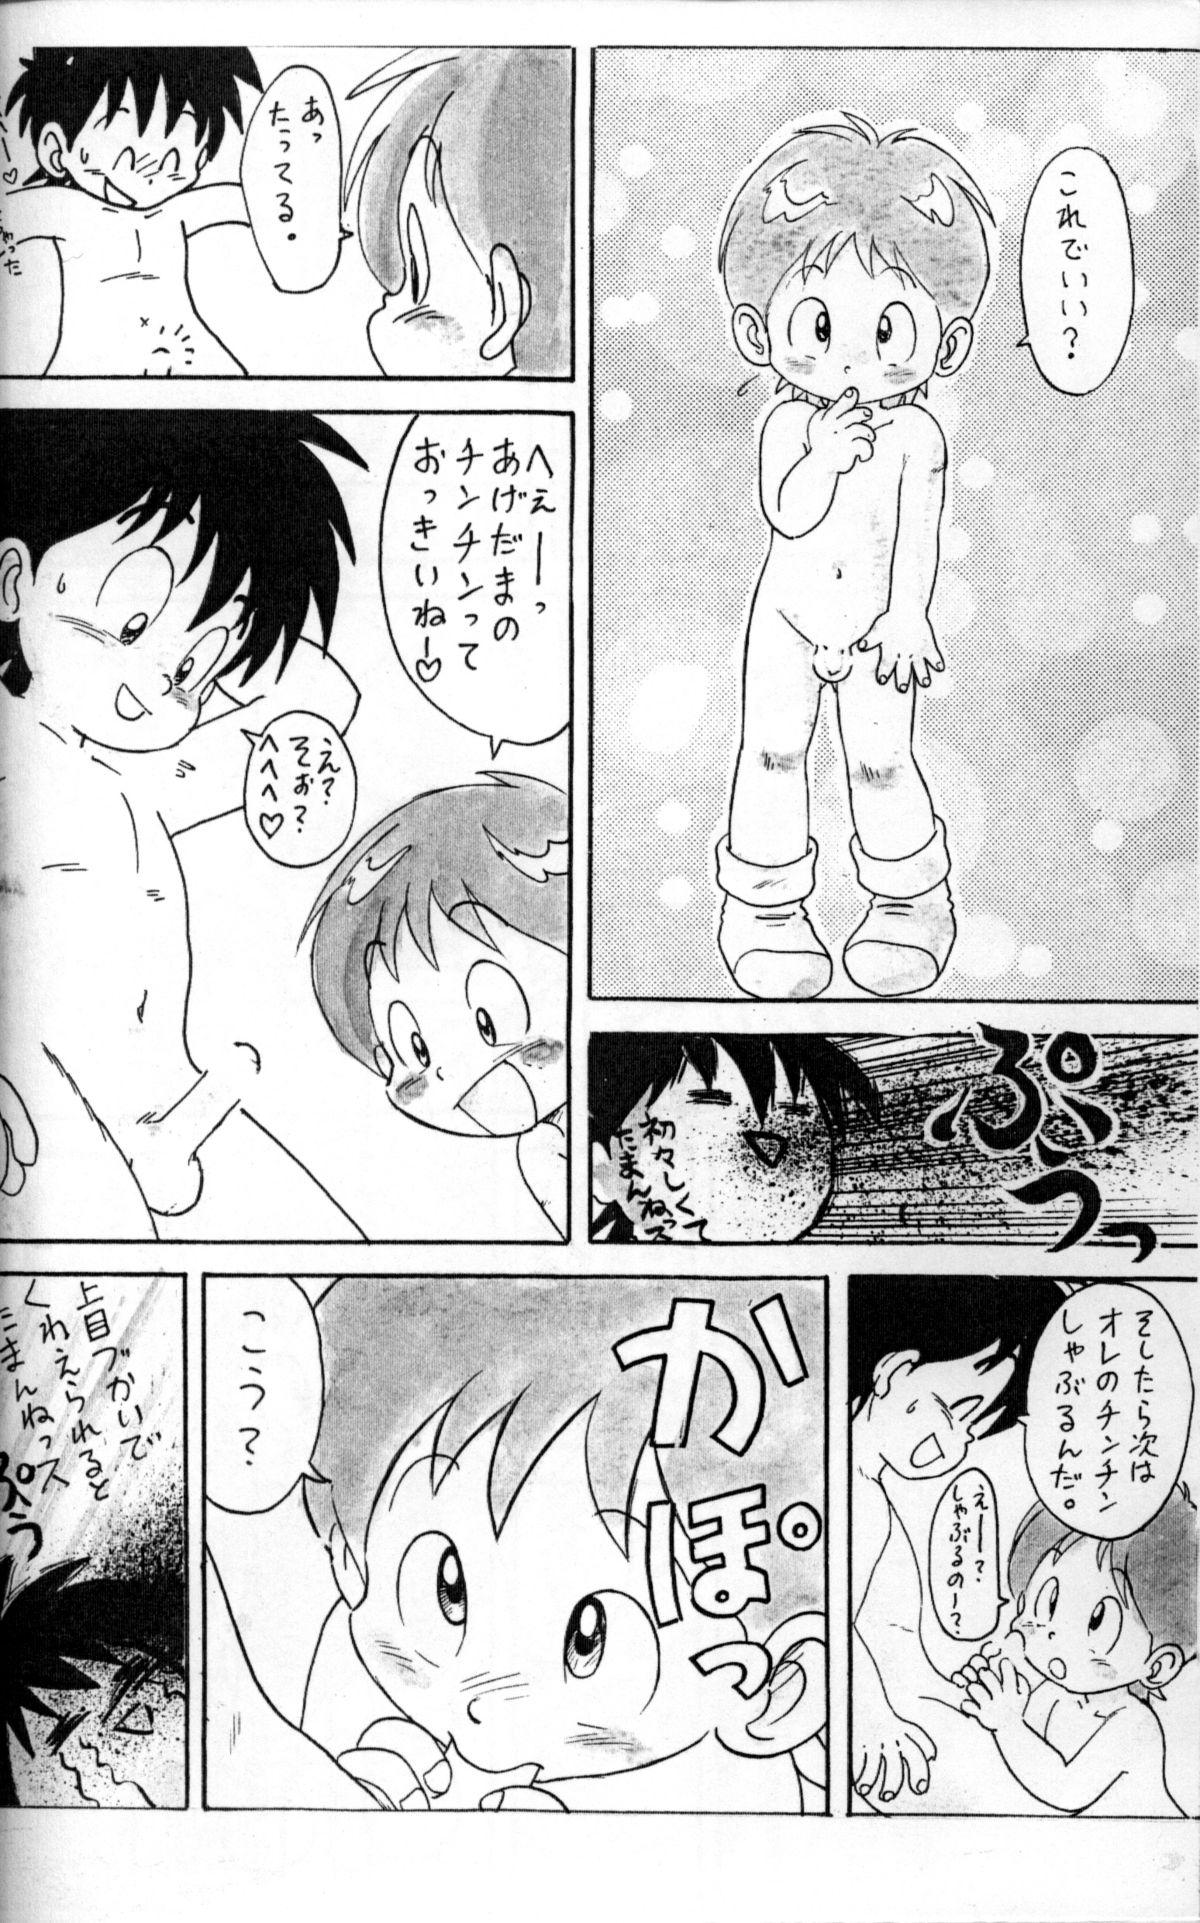 Mitsui Jun - Dreamer's Only - Anime Shota Character Mix 10